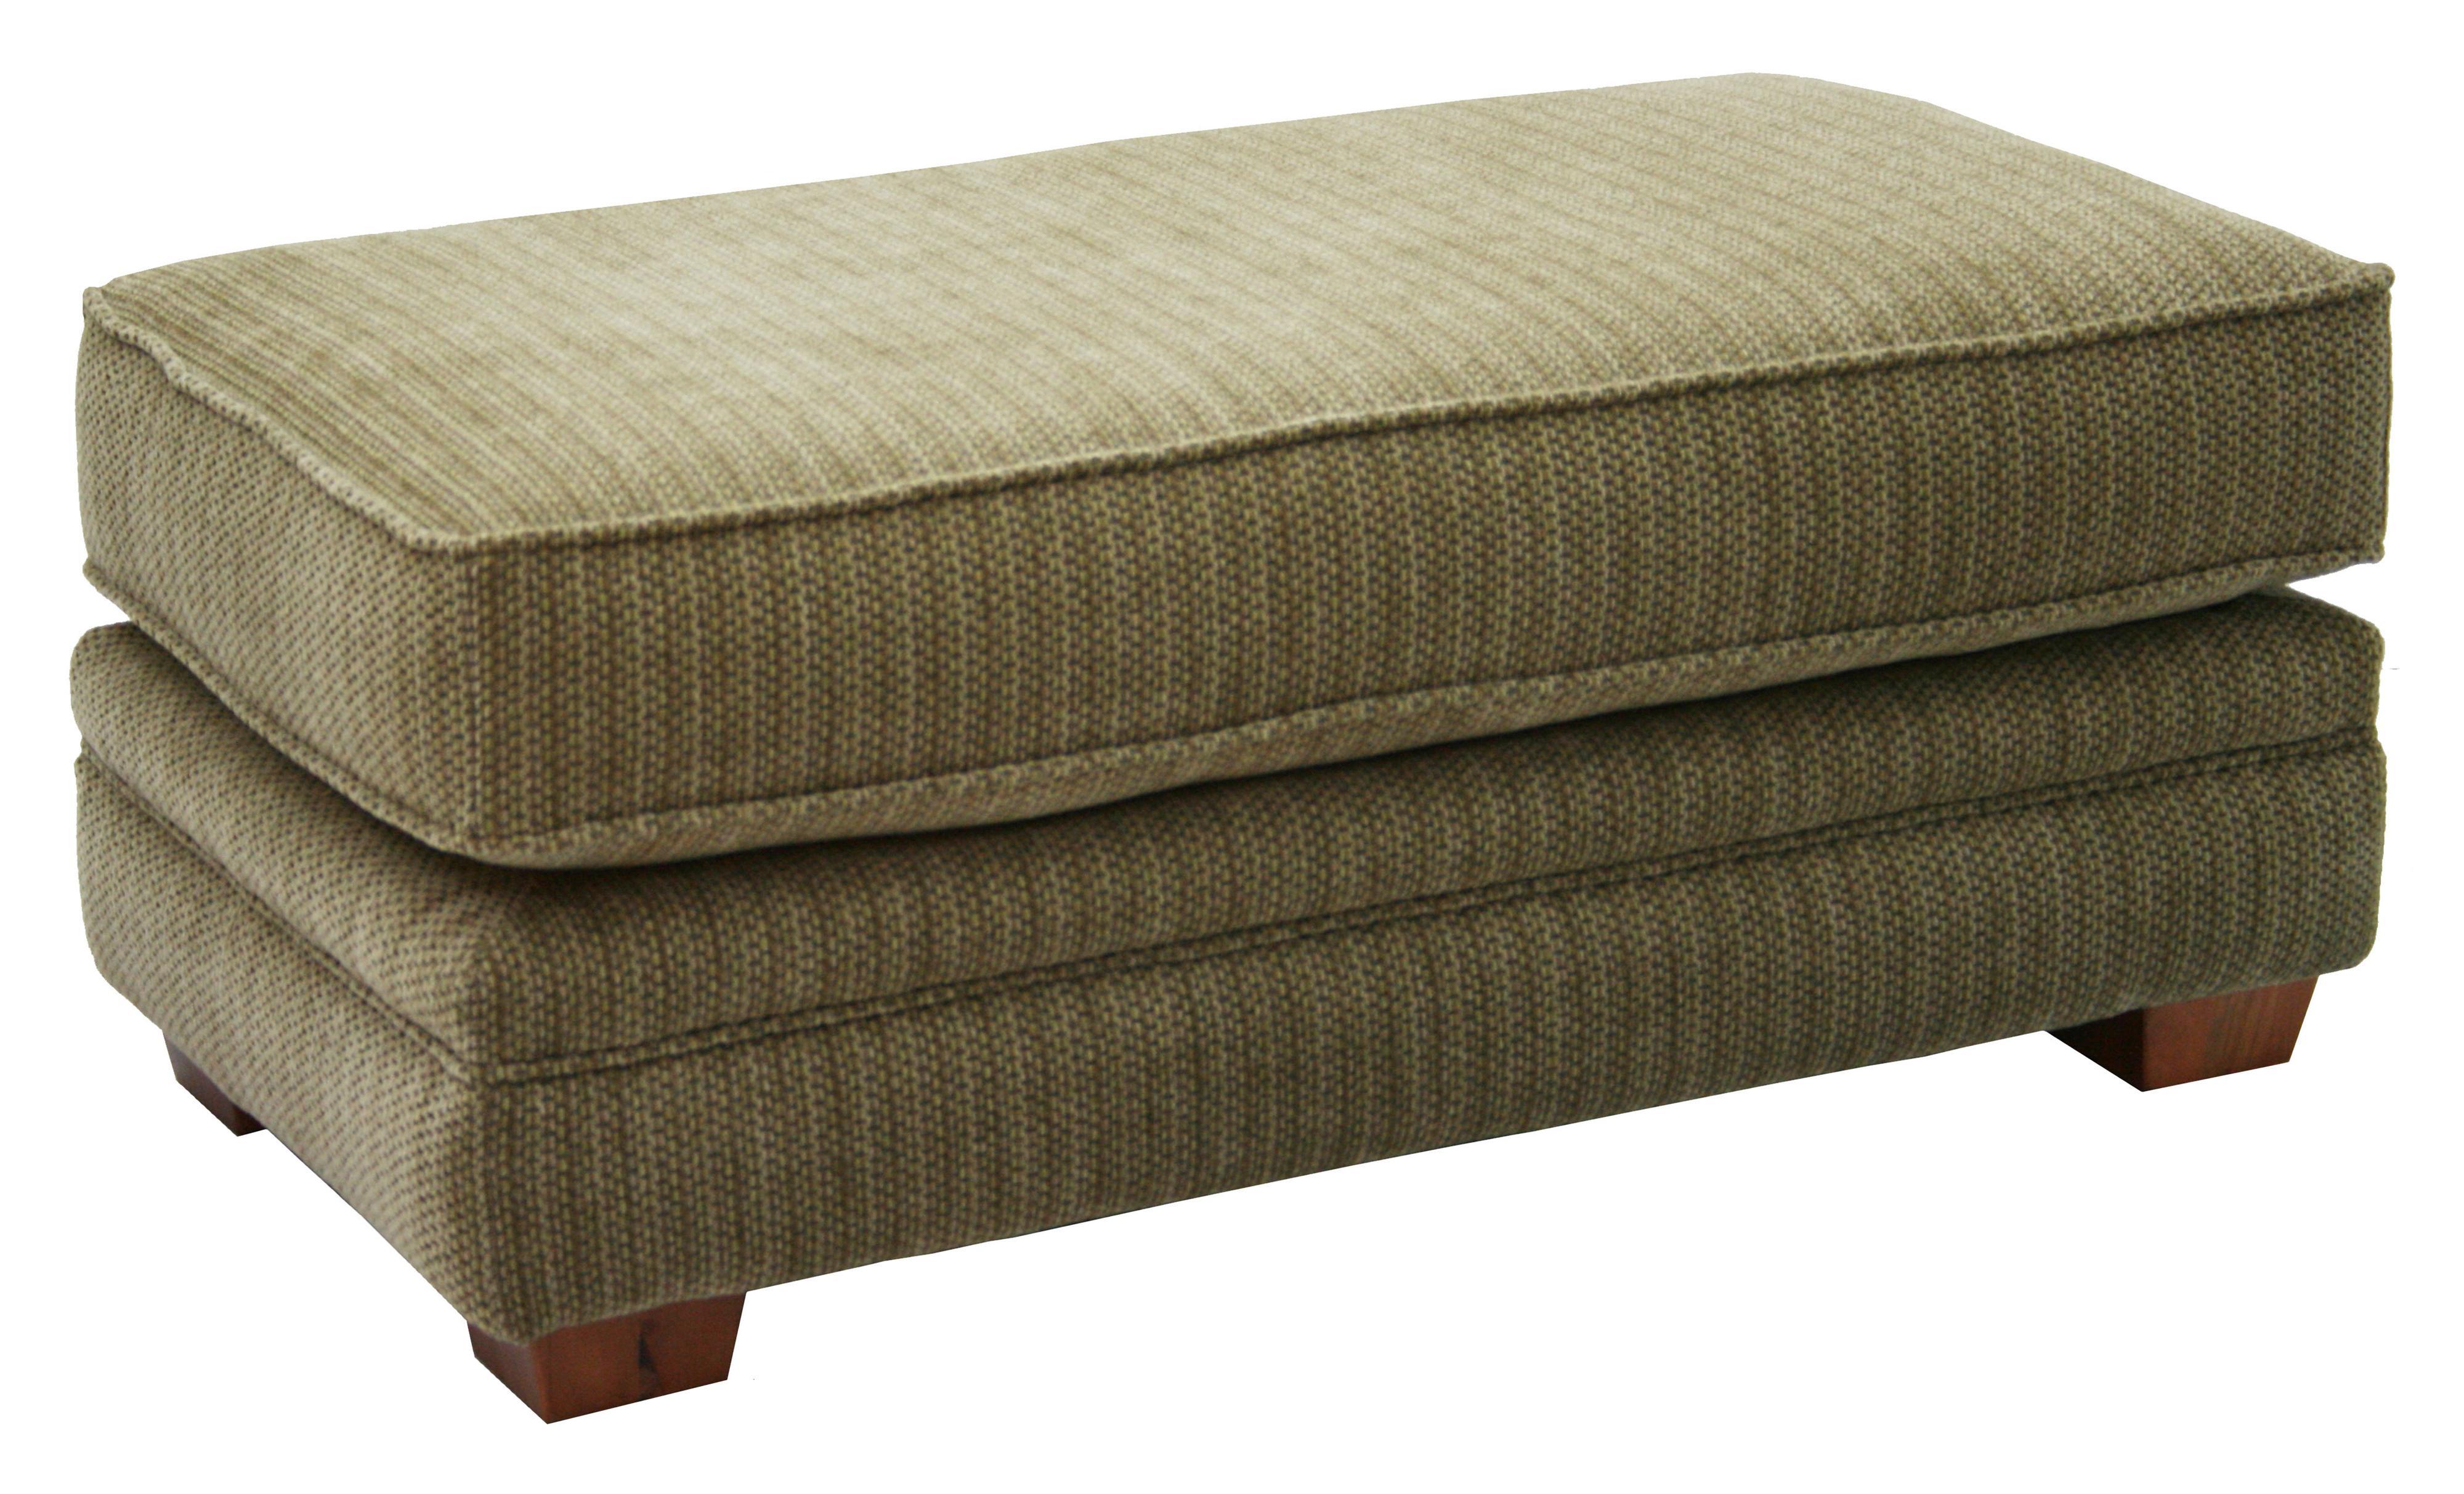 Jackson Furniture Anniston Ottoman - Item Number: 4342-10